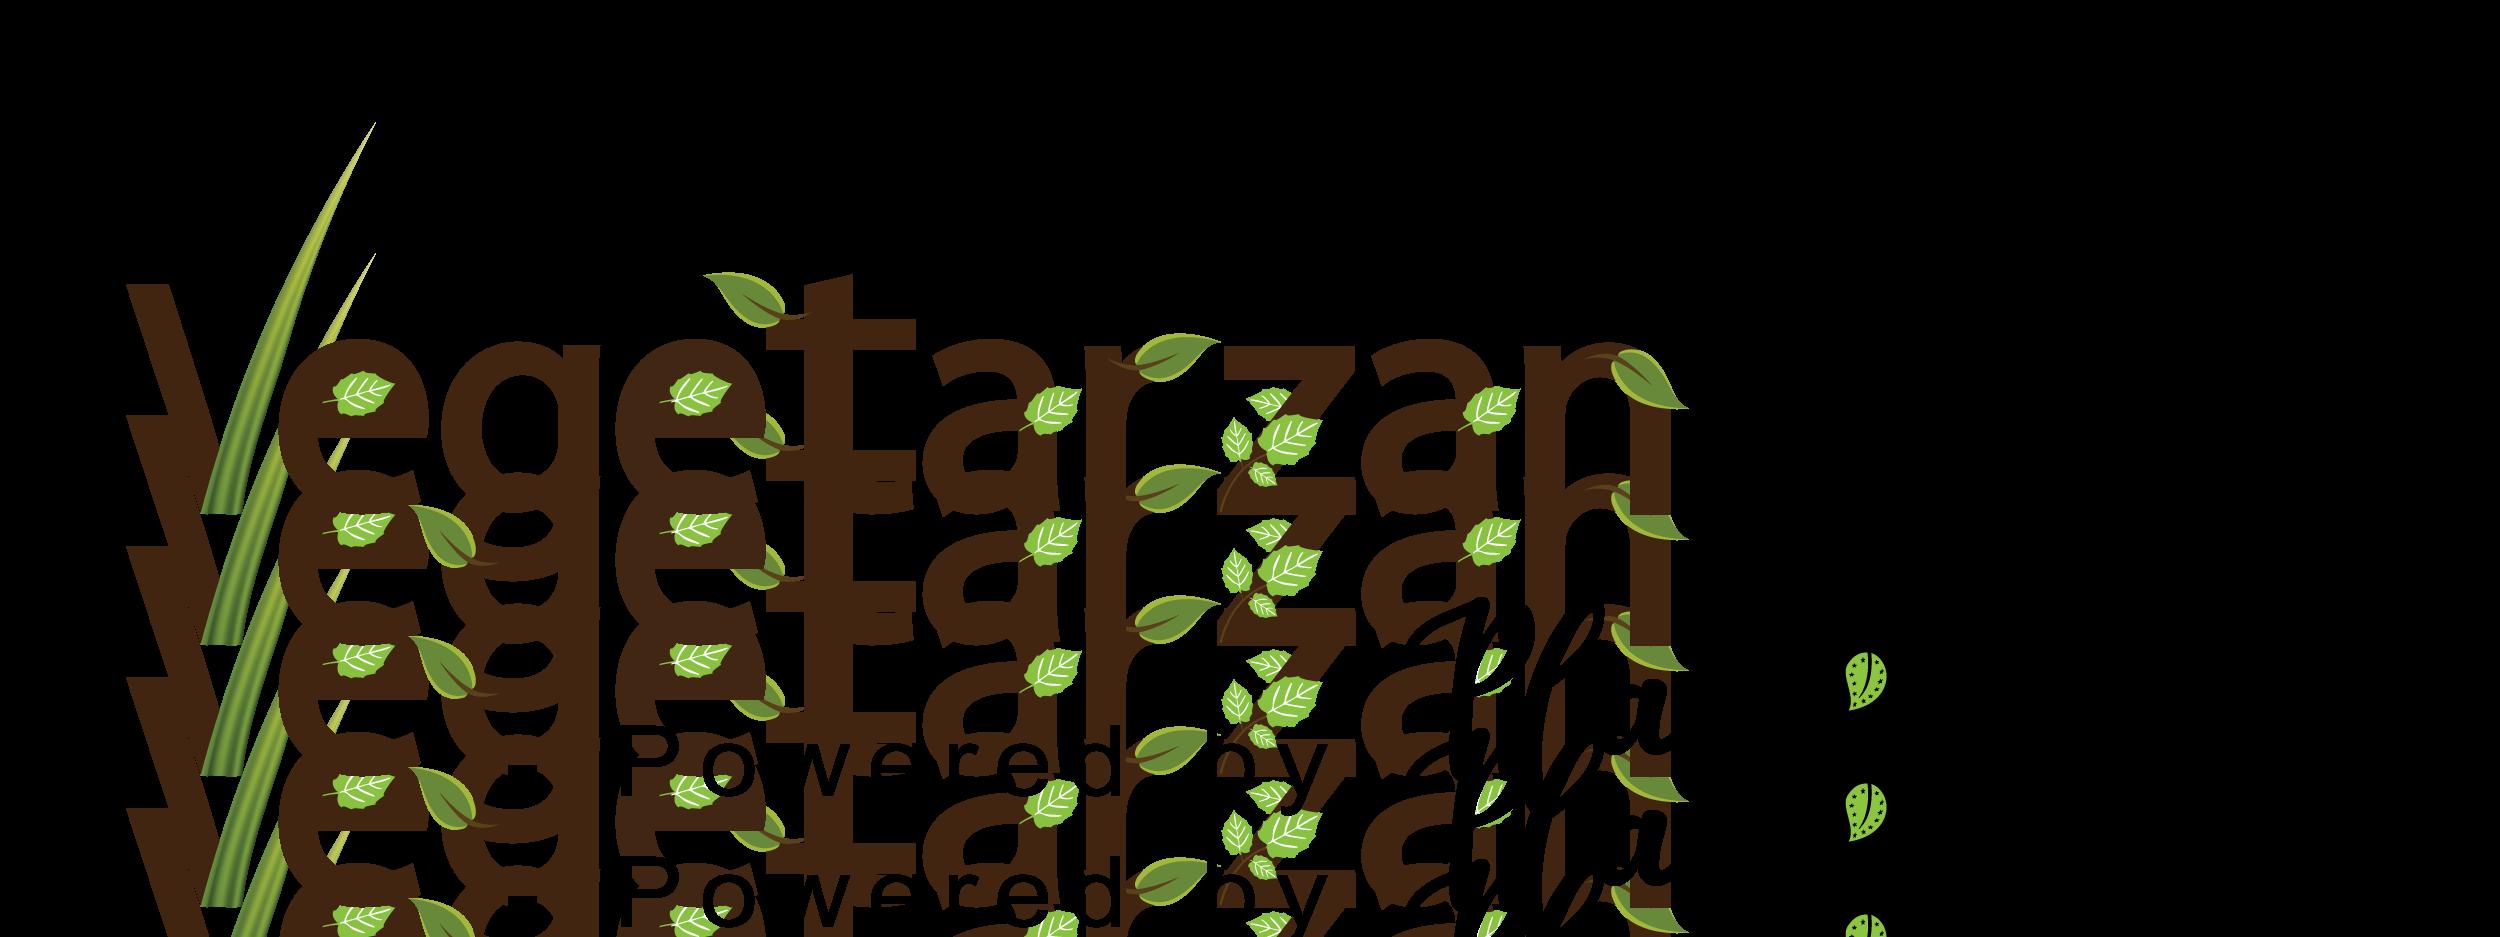 vegetarzan_plantmate